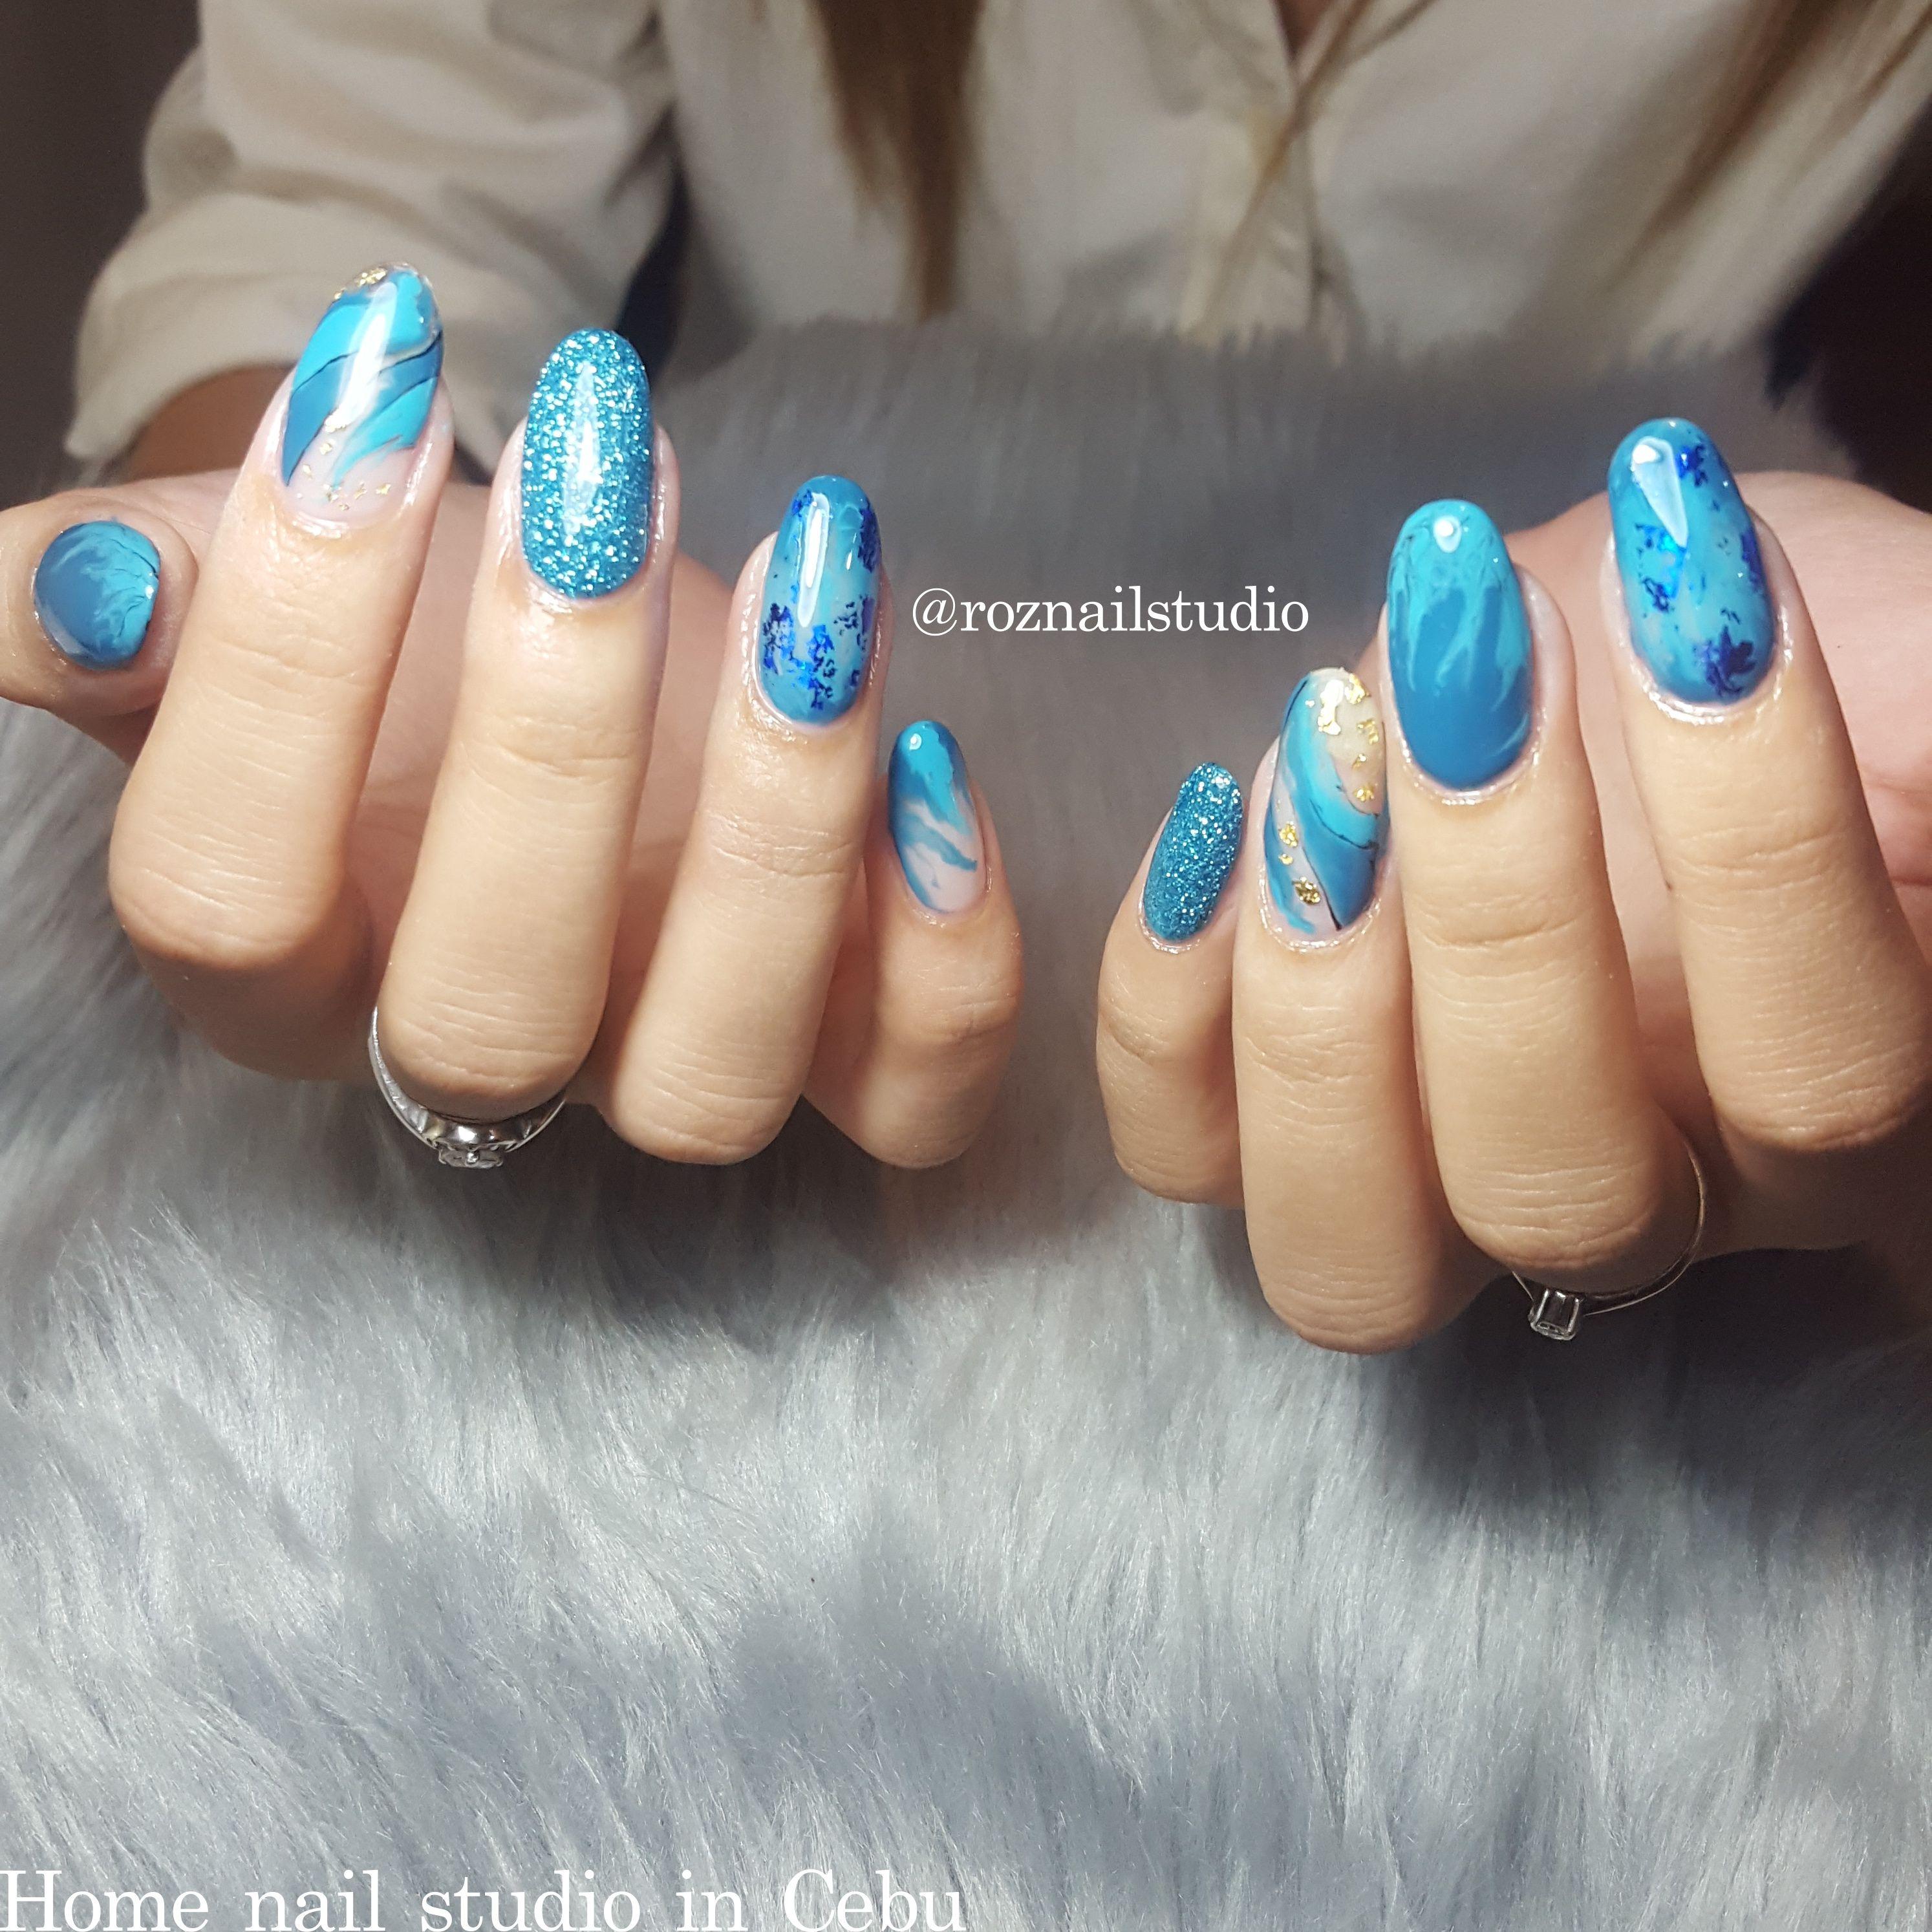 Custom Blue Gel Design By N Roz Owner Of Roz Nail Studio Cebu Gel Designs Nail Studio Blue Gel